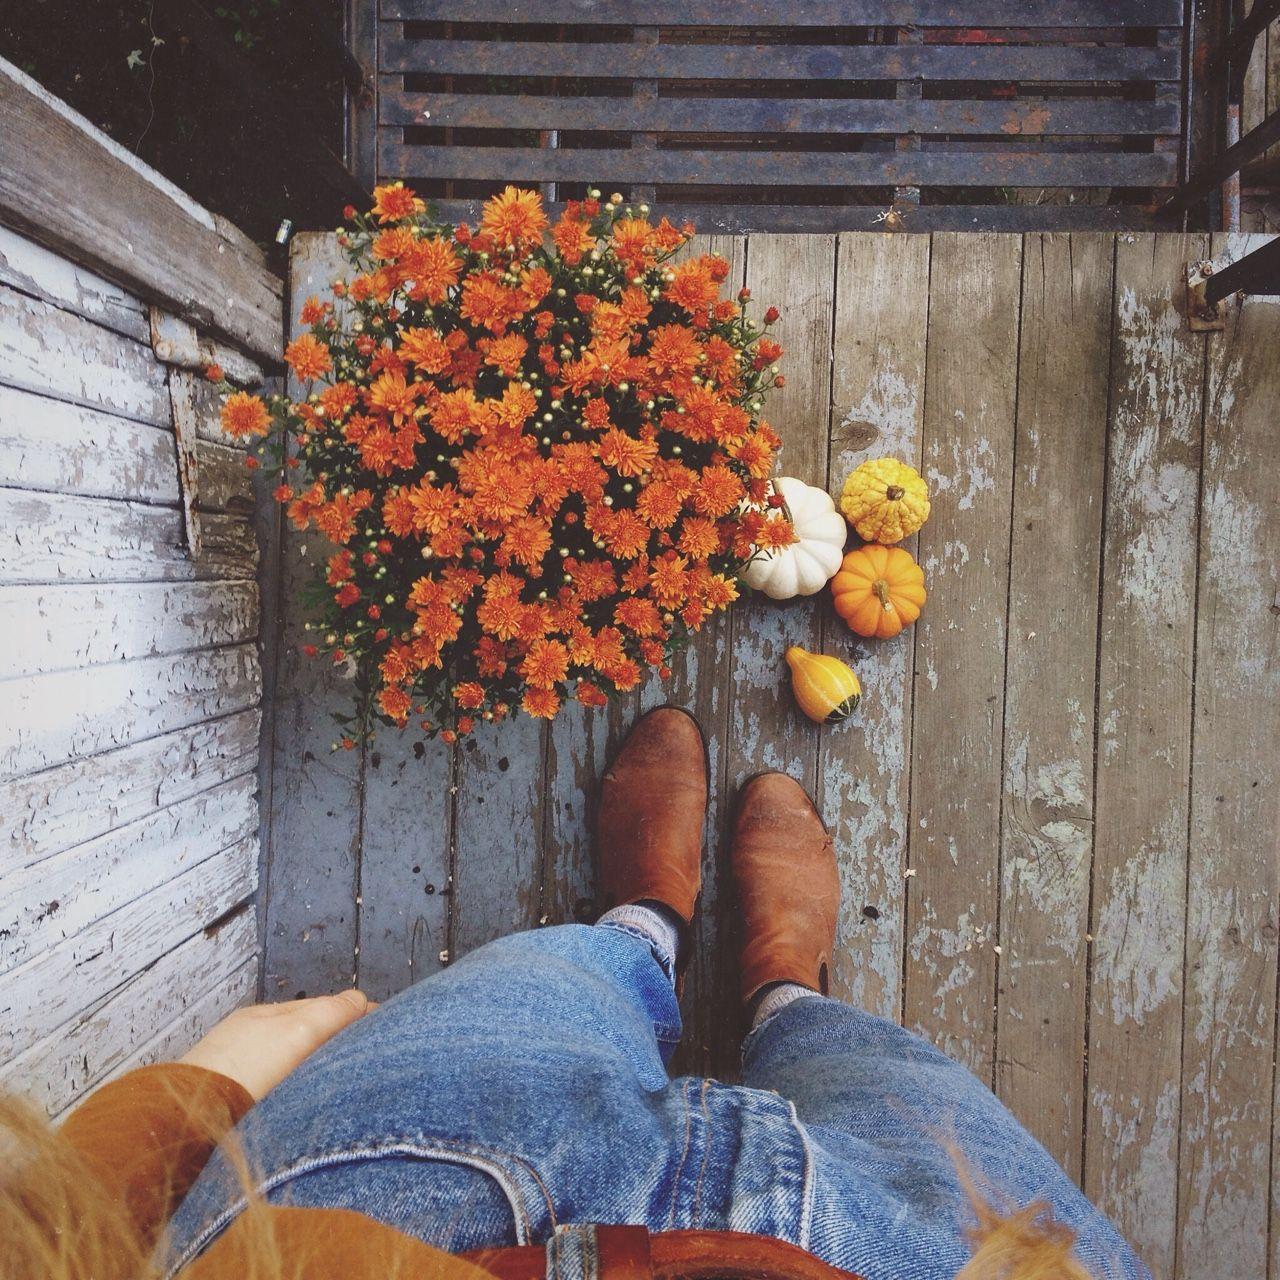 Autumng Asthetics: Fall Vibes // Indie Orange Aesthetics Grunge Tumblr